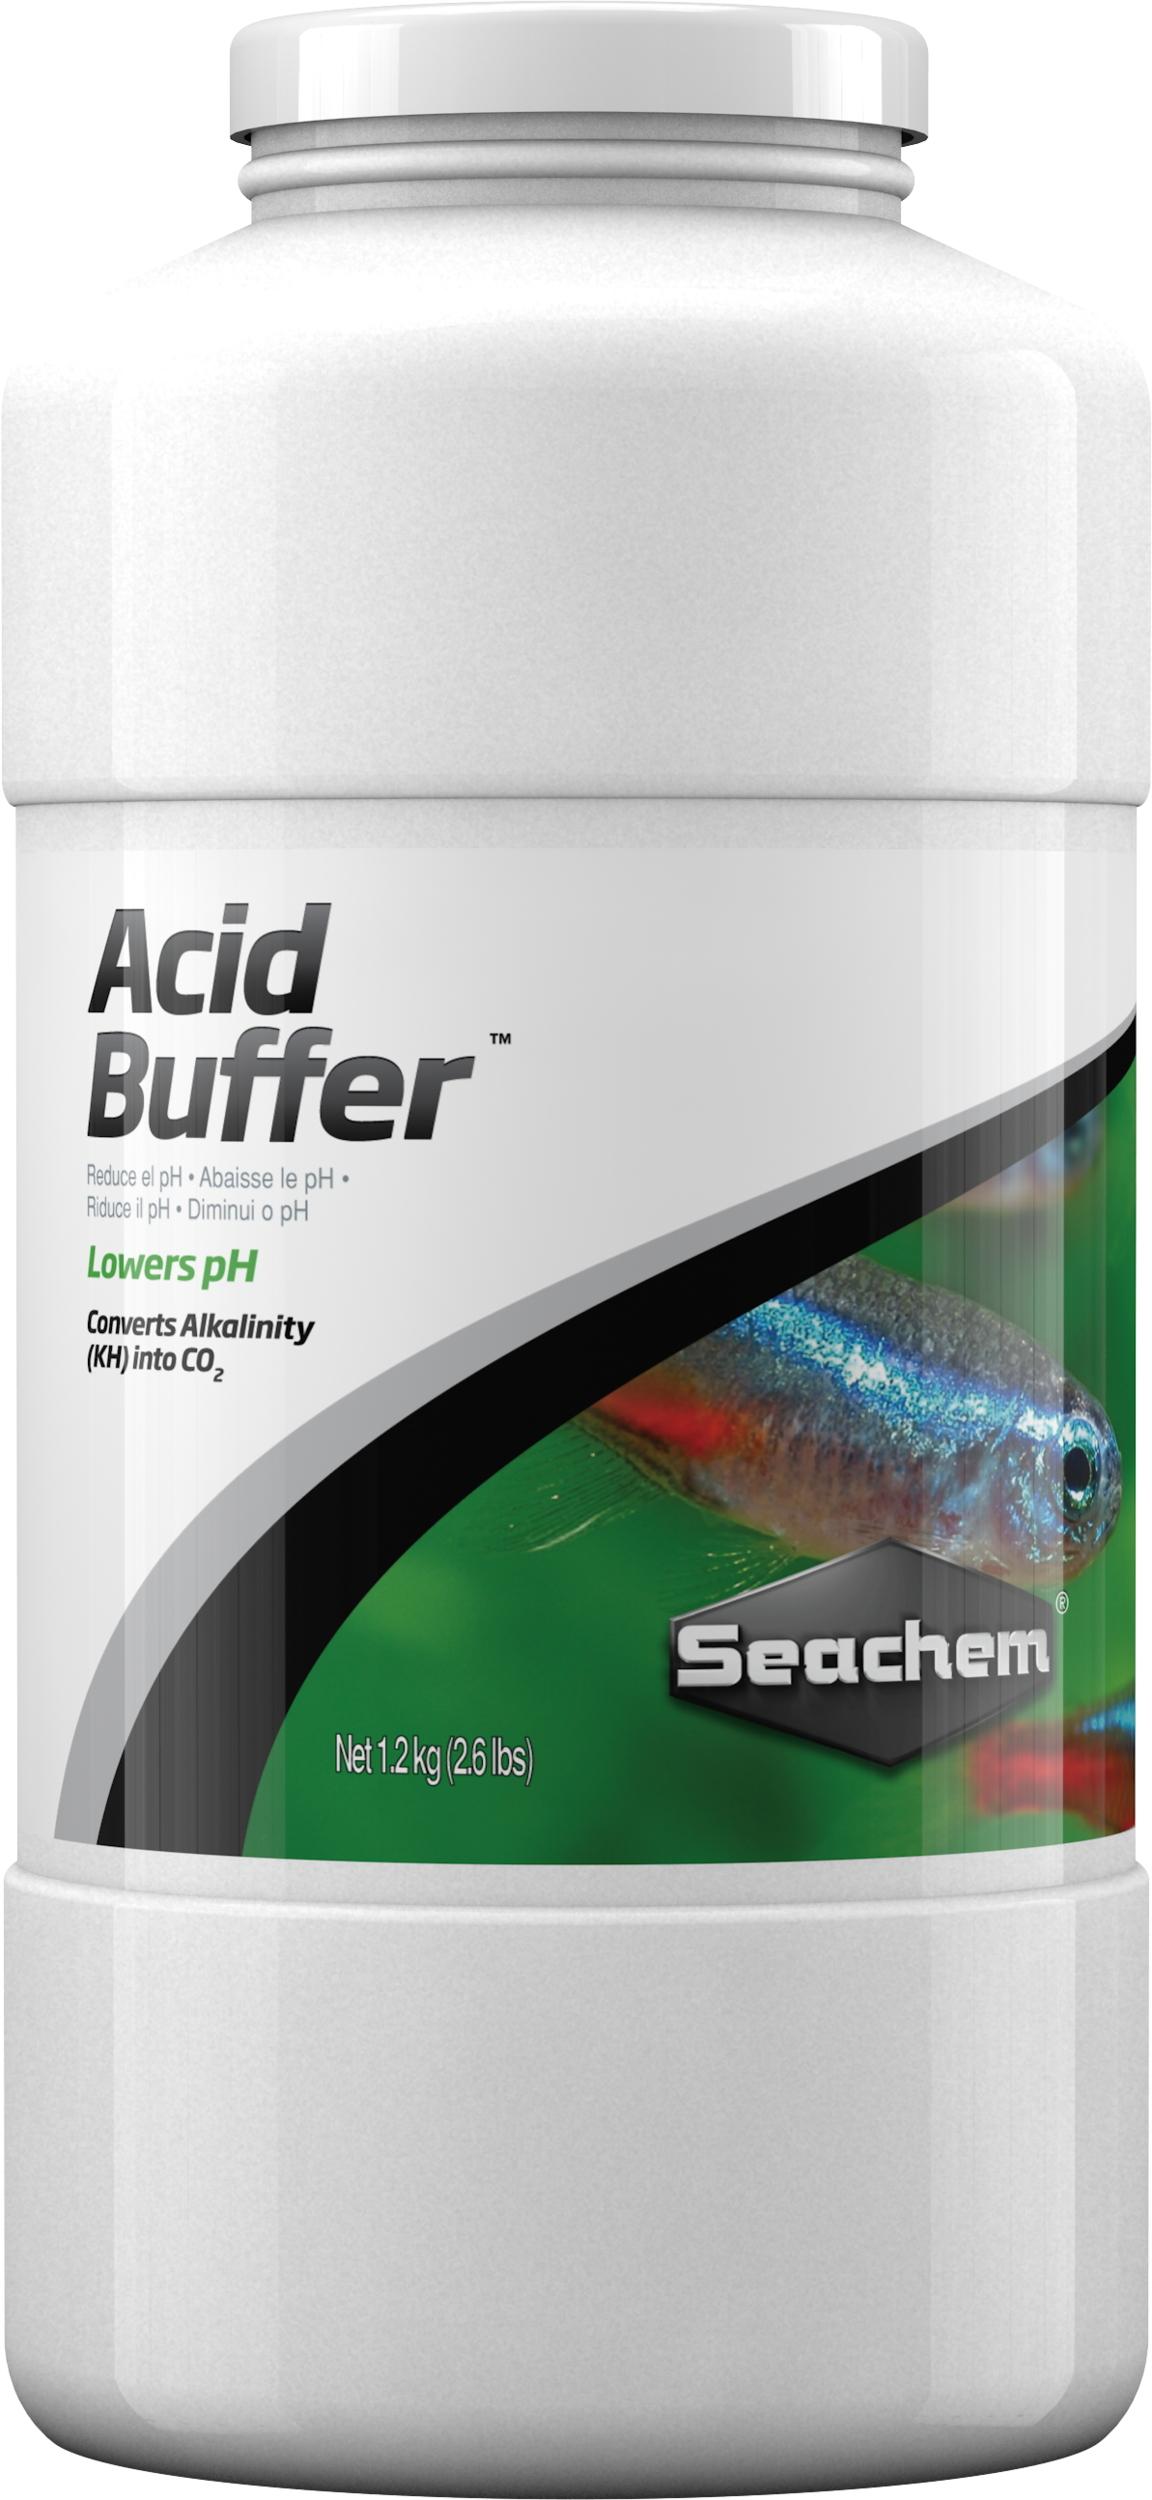 AcidBuffer-1kg